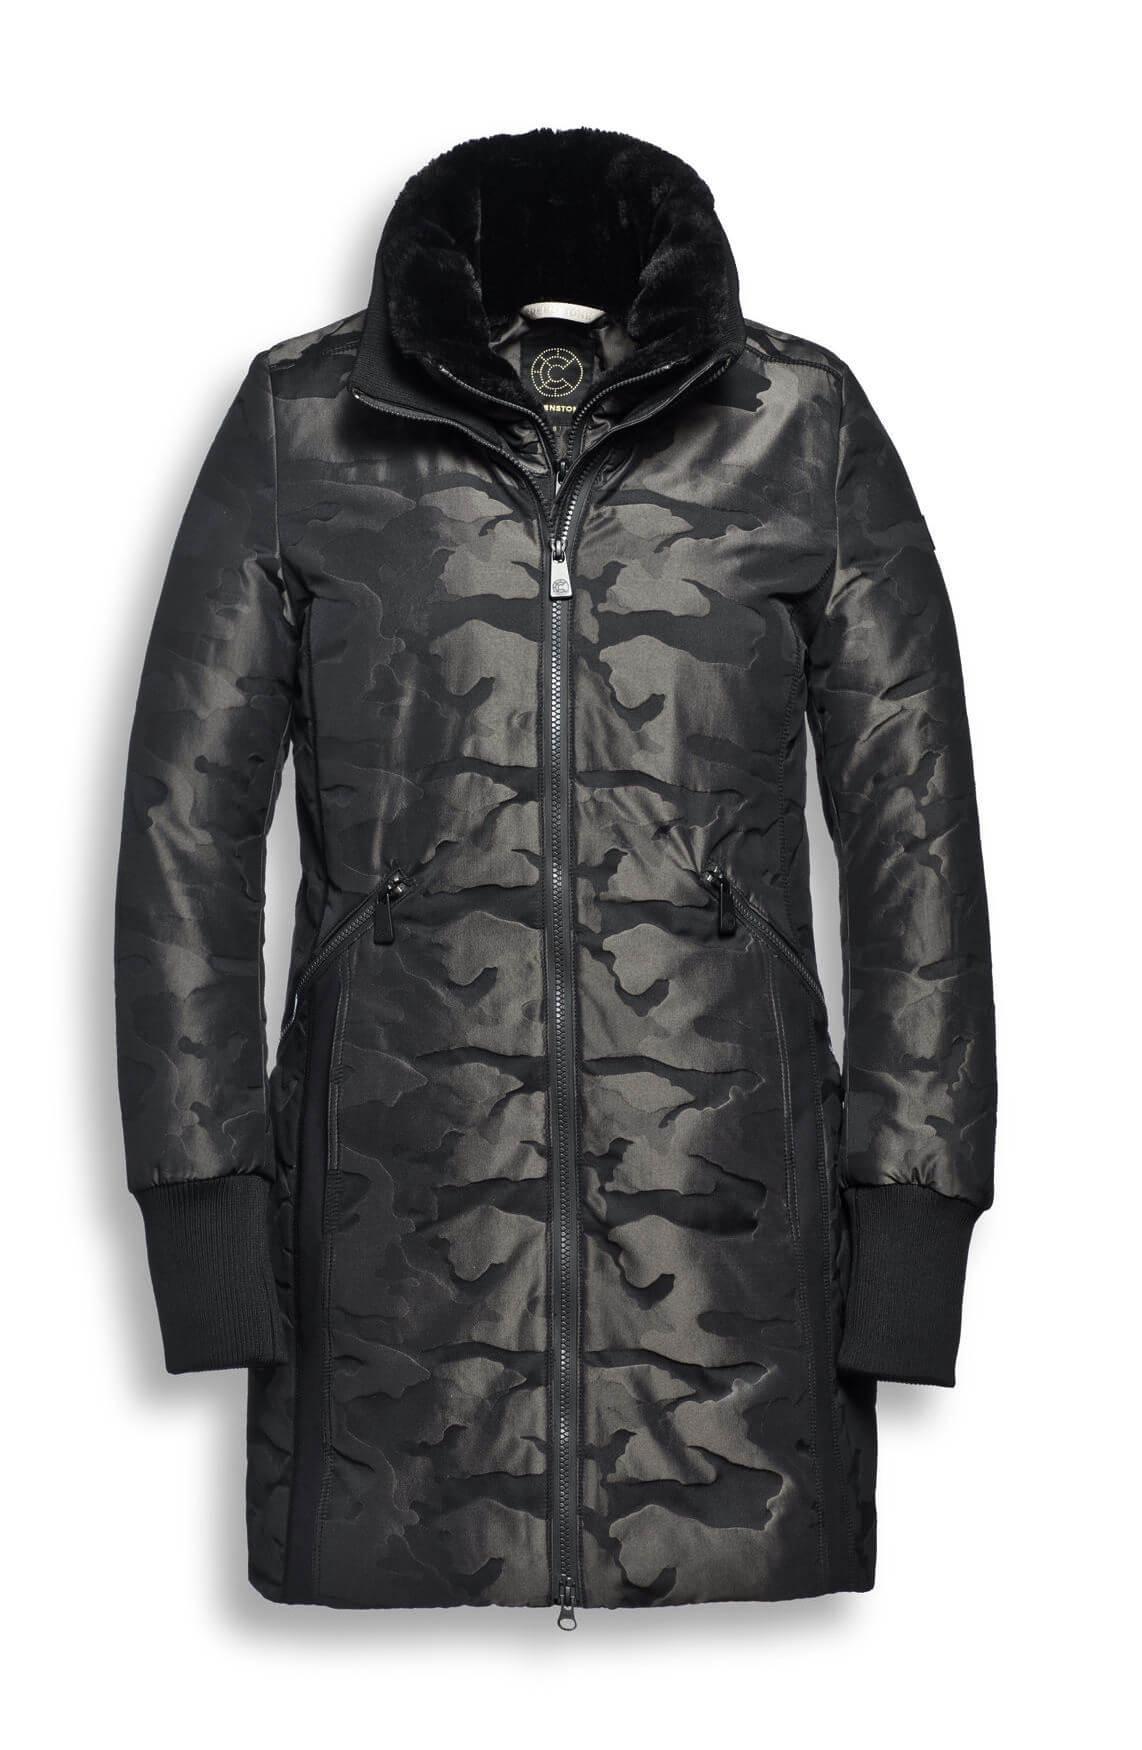 Creenstone Dames Gewatteerde jas met camouflage patroon zwart